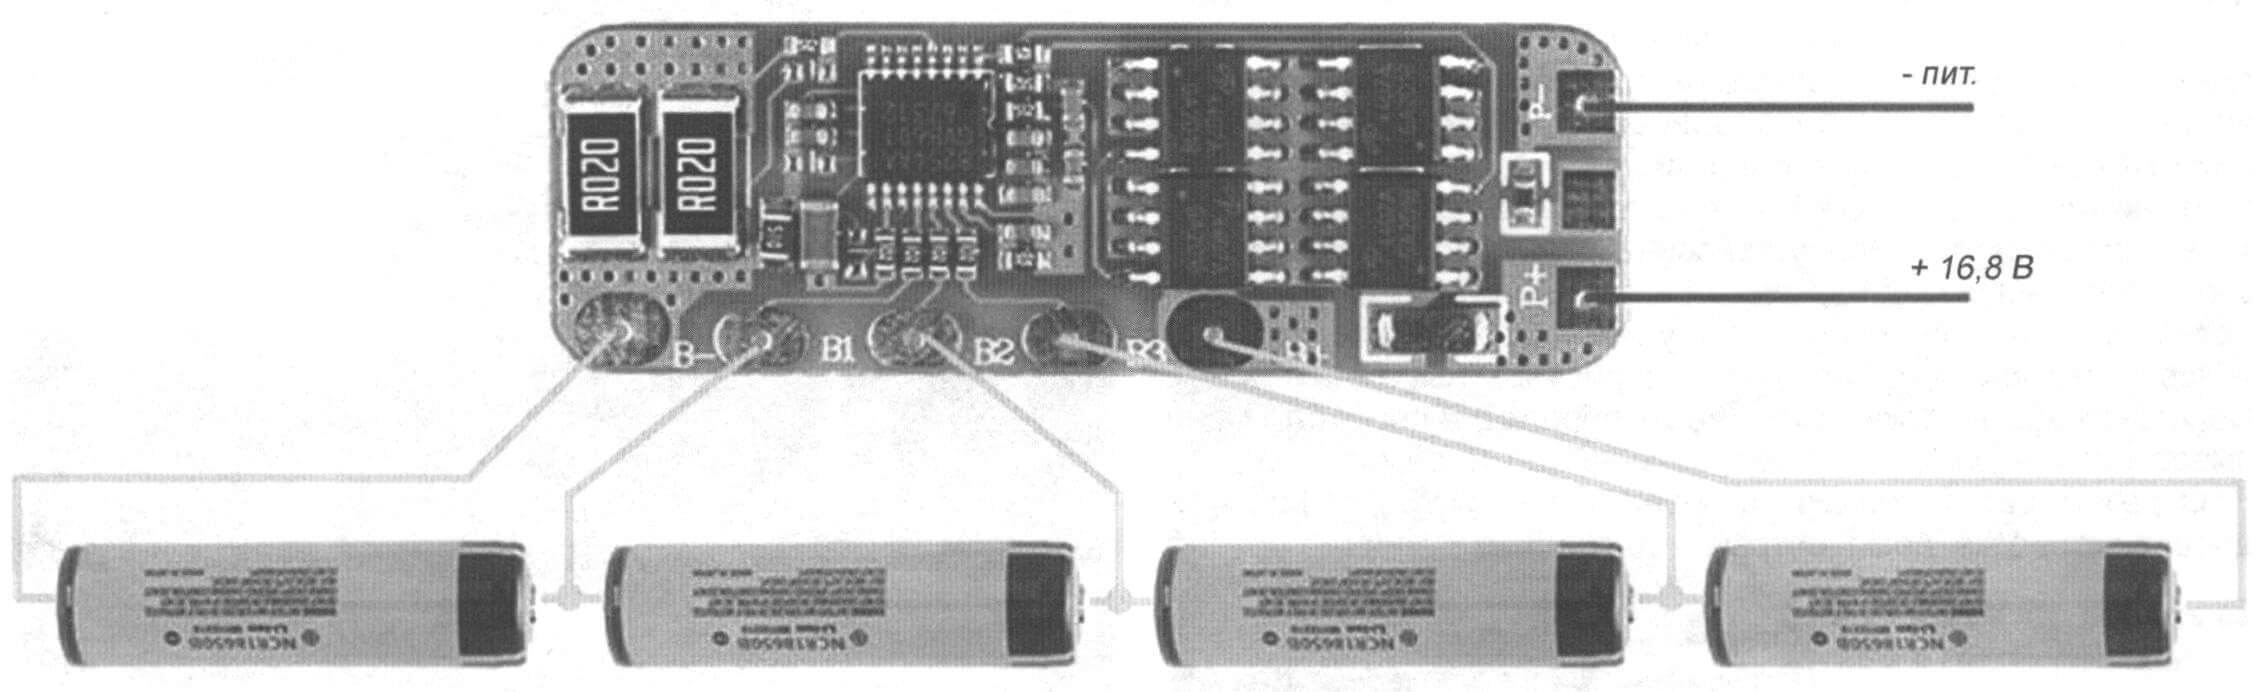 Фото 7. Плата контроллера на четыре литиевых элемента